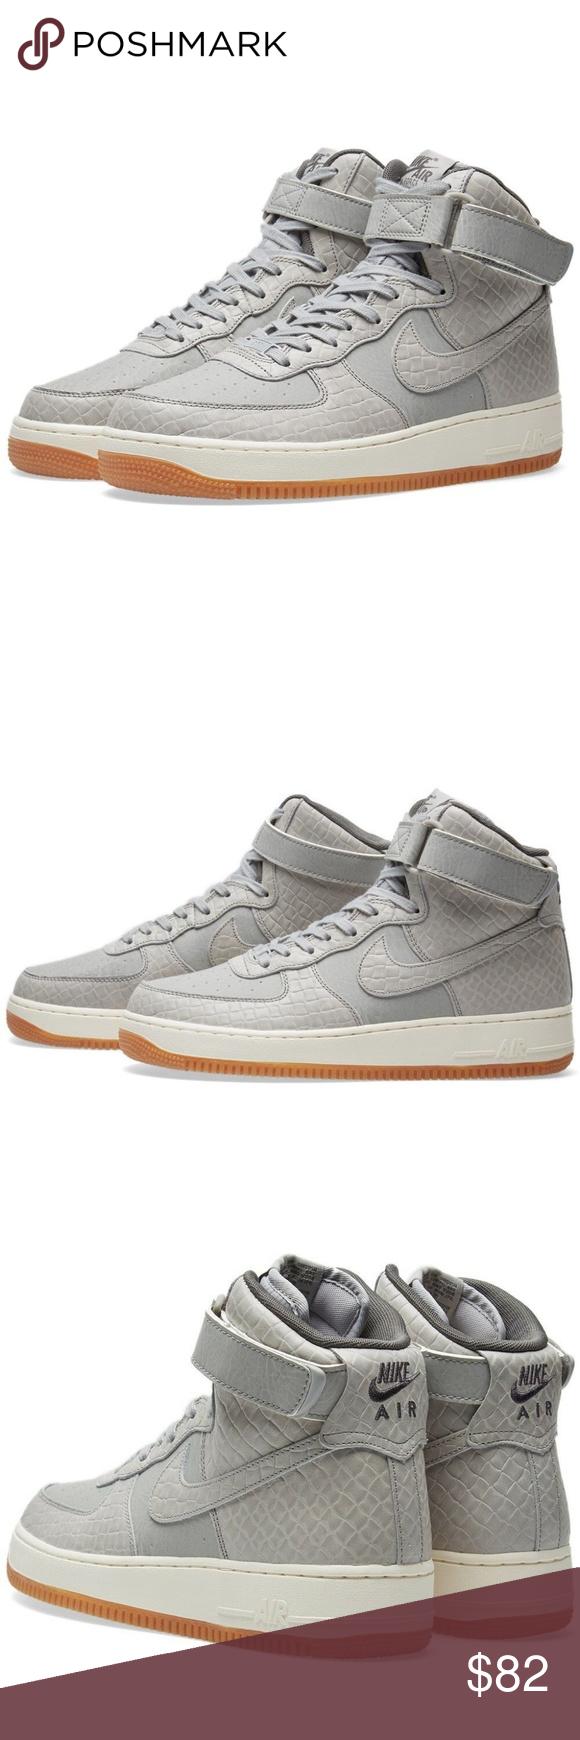 wholesale dealer 64745 7680b New Nike women s Air Force 1 High Premium Shoes New Nike Women s Air Force  1 High PREMIUM Shoes Style Number  654440-008 Wolf Grey Wolf Grey Women    Adult ...